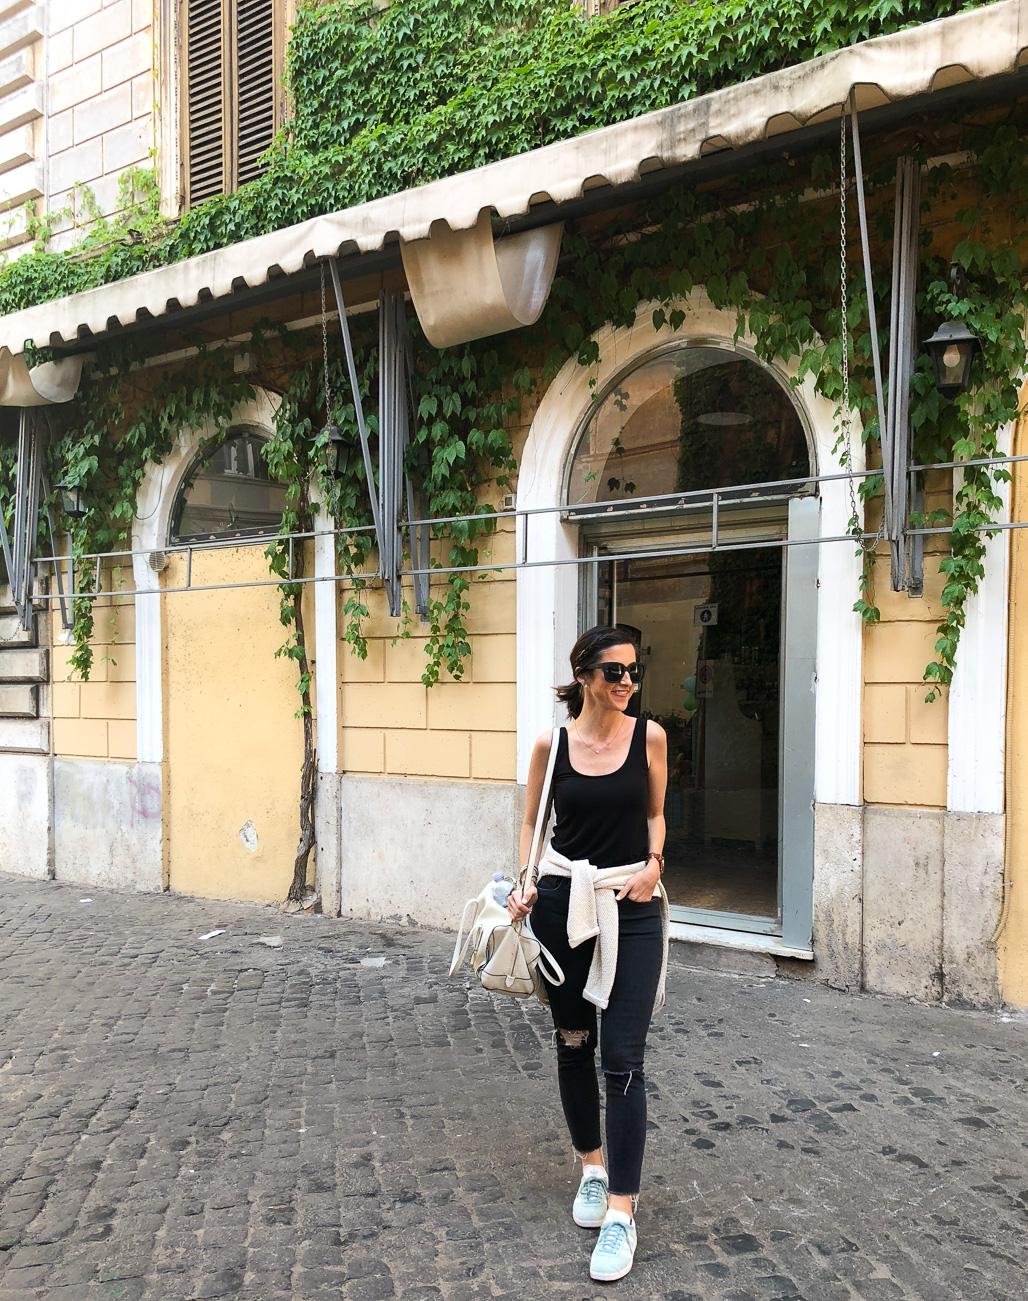 Food Tour Italy   Rome, Italy   Cobalt Chronicles   Washington, DC Travel Blogger